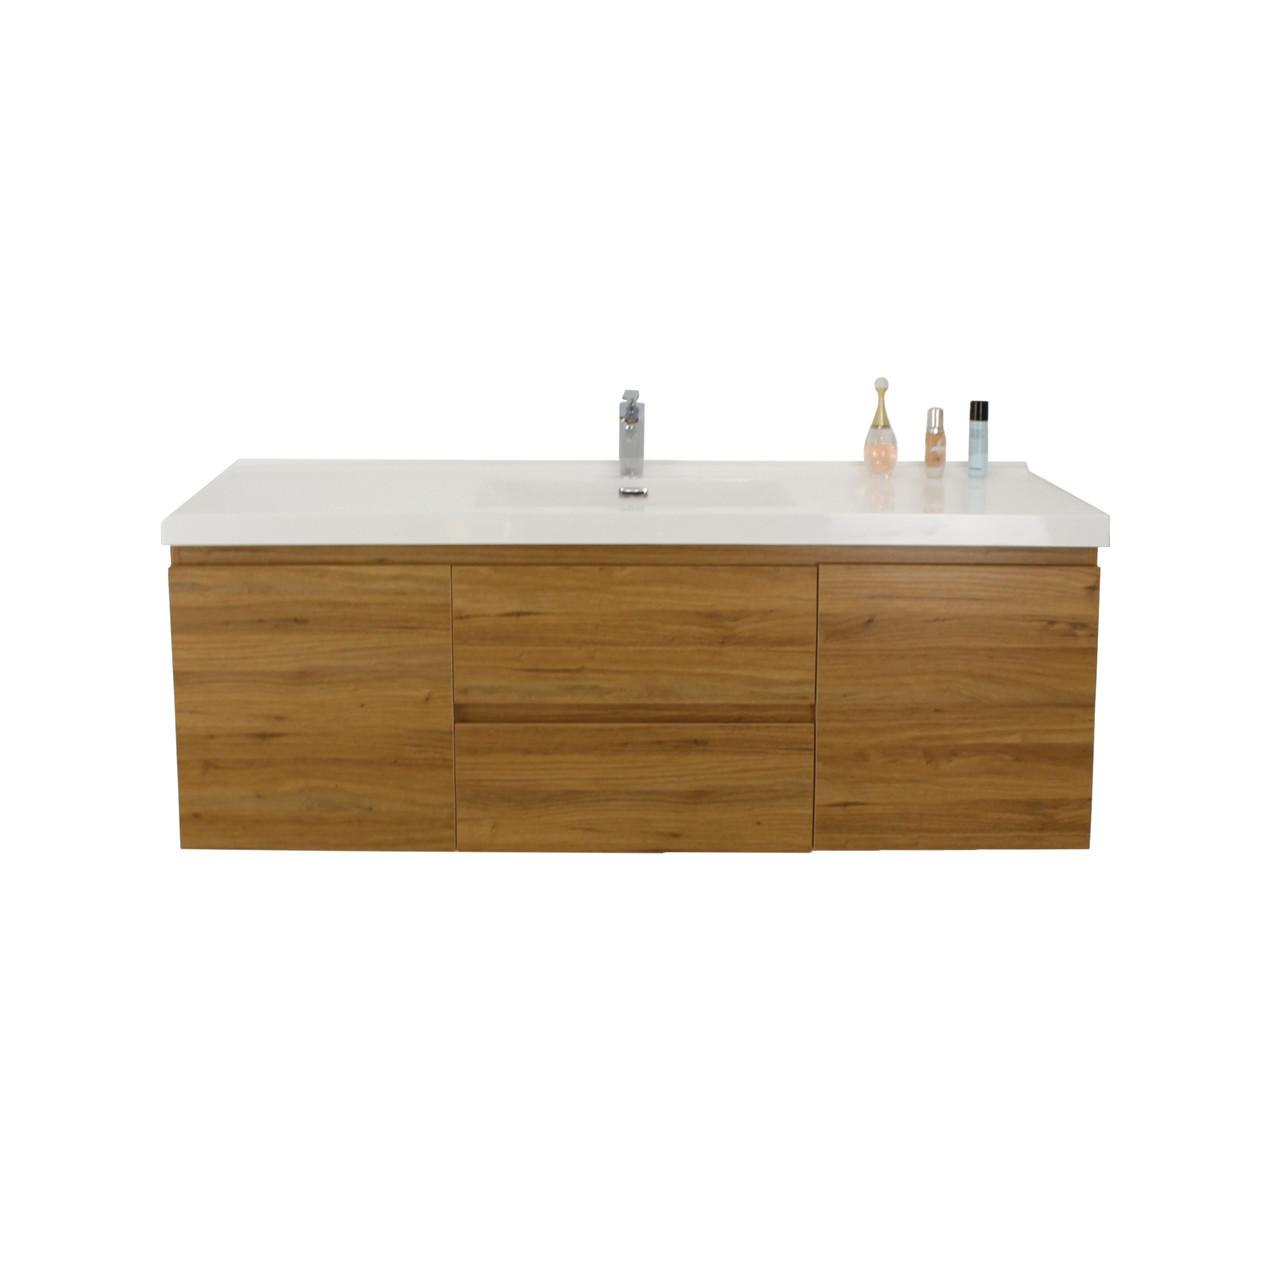 bohemia 60 single sink black wall mounted modern bathroom vanity with reinforced acrylic sink